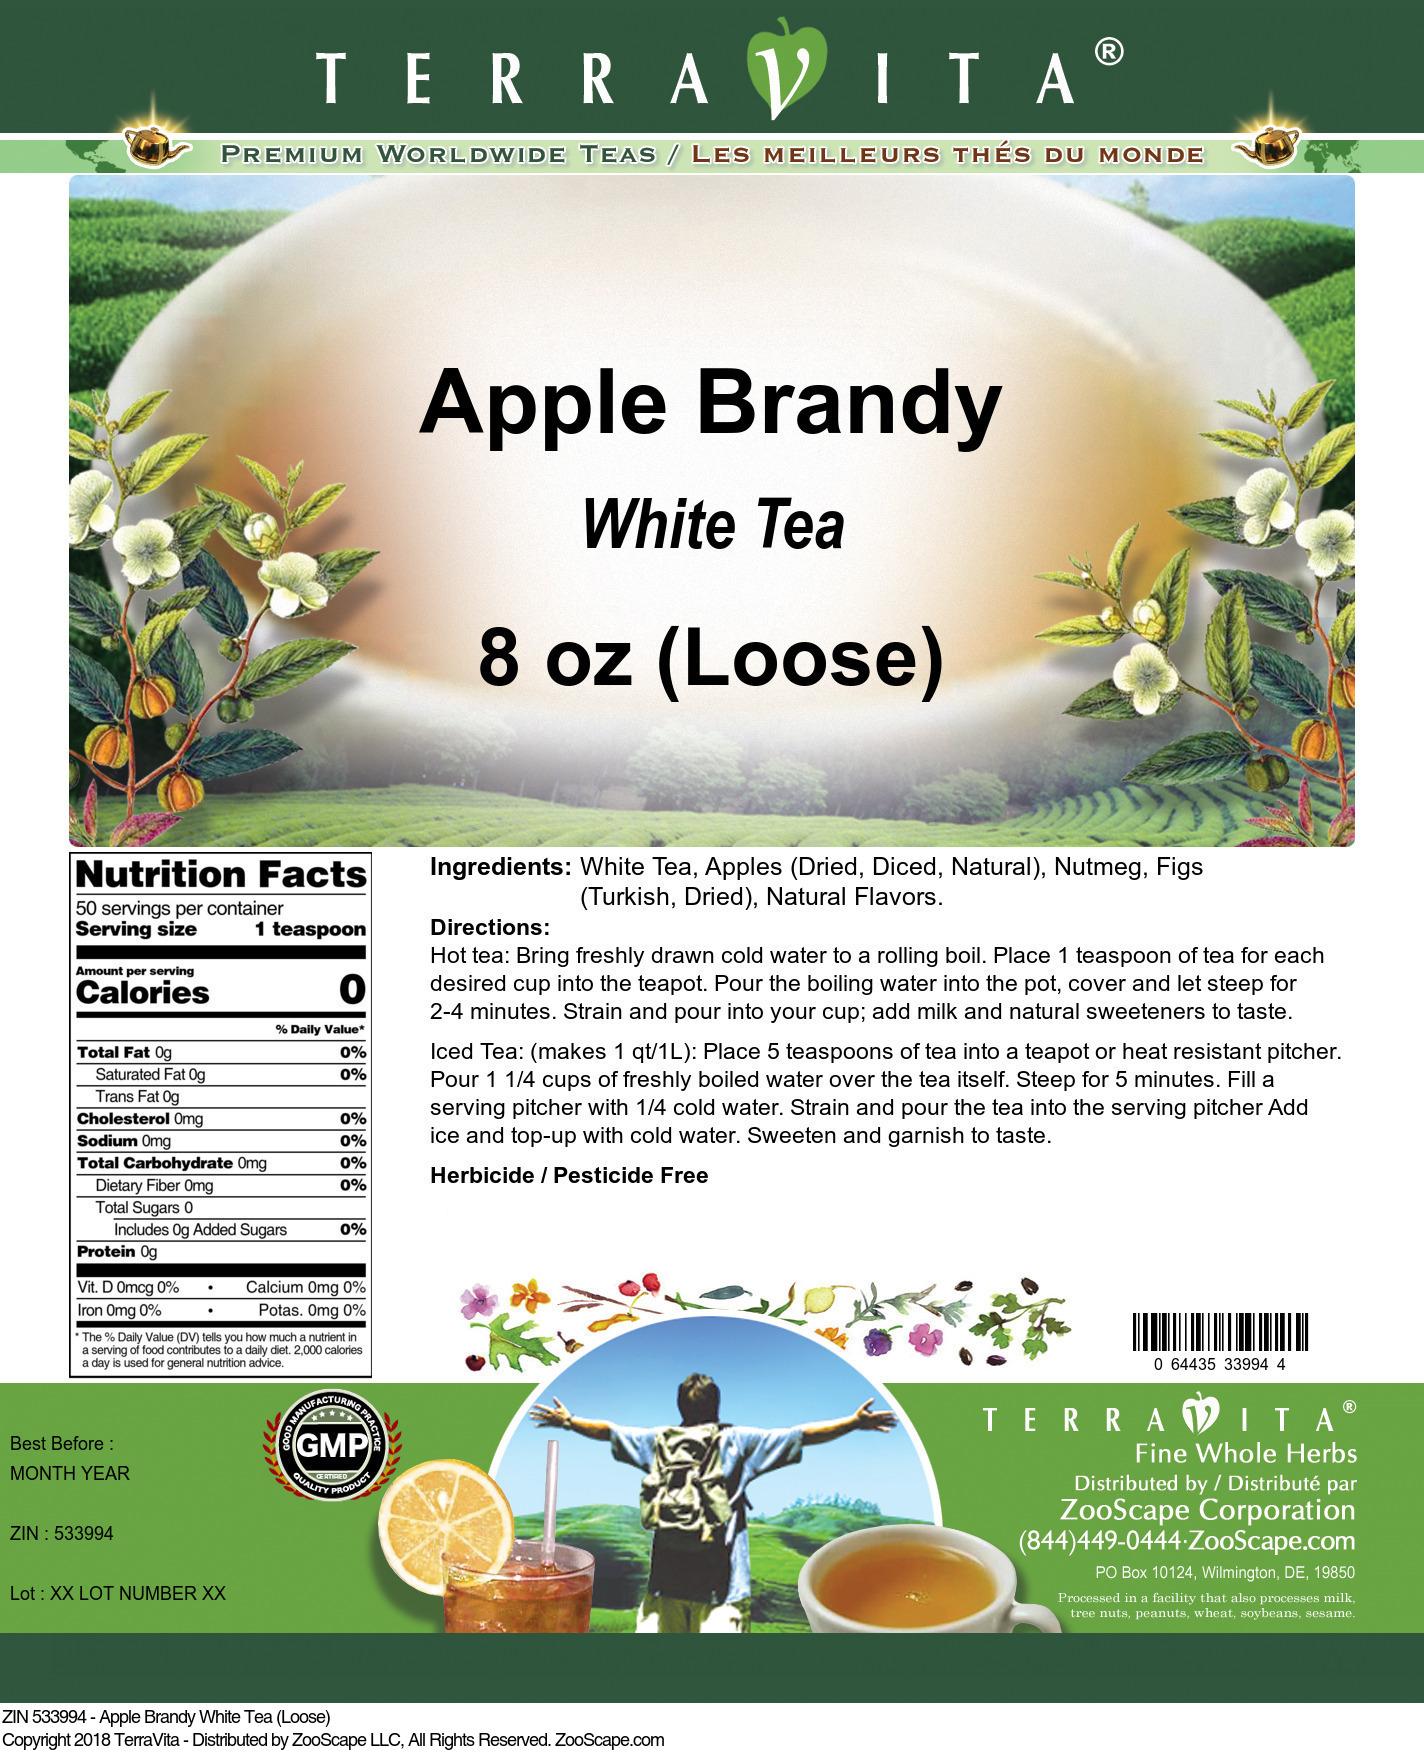 Apple Brandy White Tea